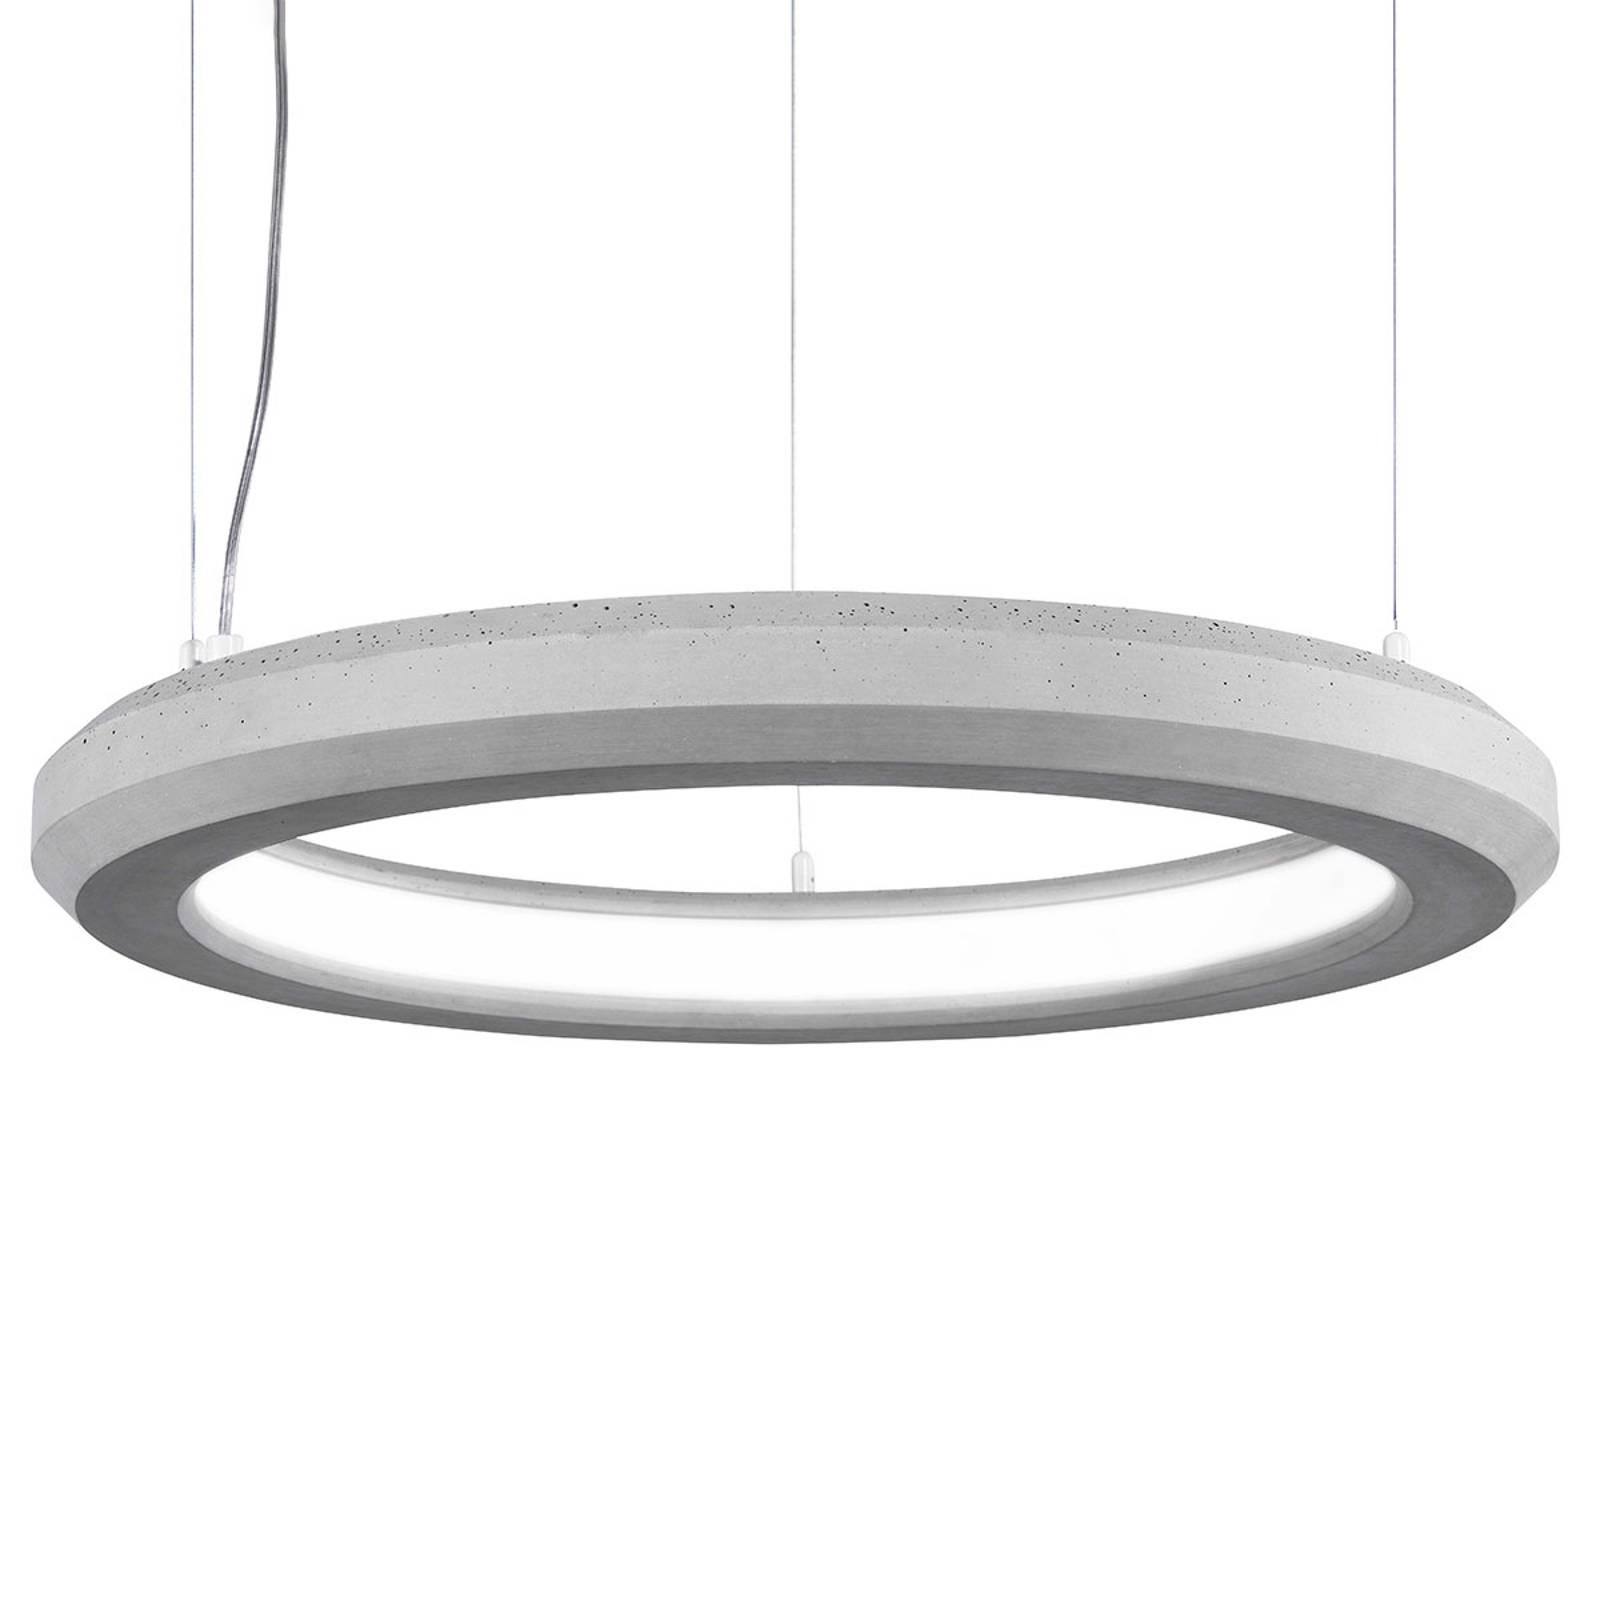 LED-Hängeleuchte Materica innen Ø 60 cm beton